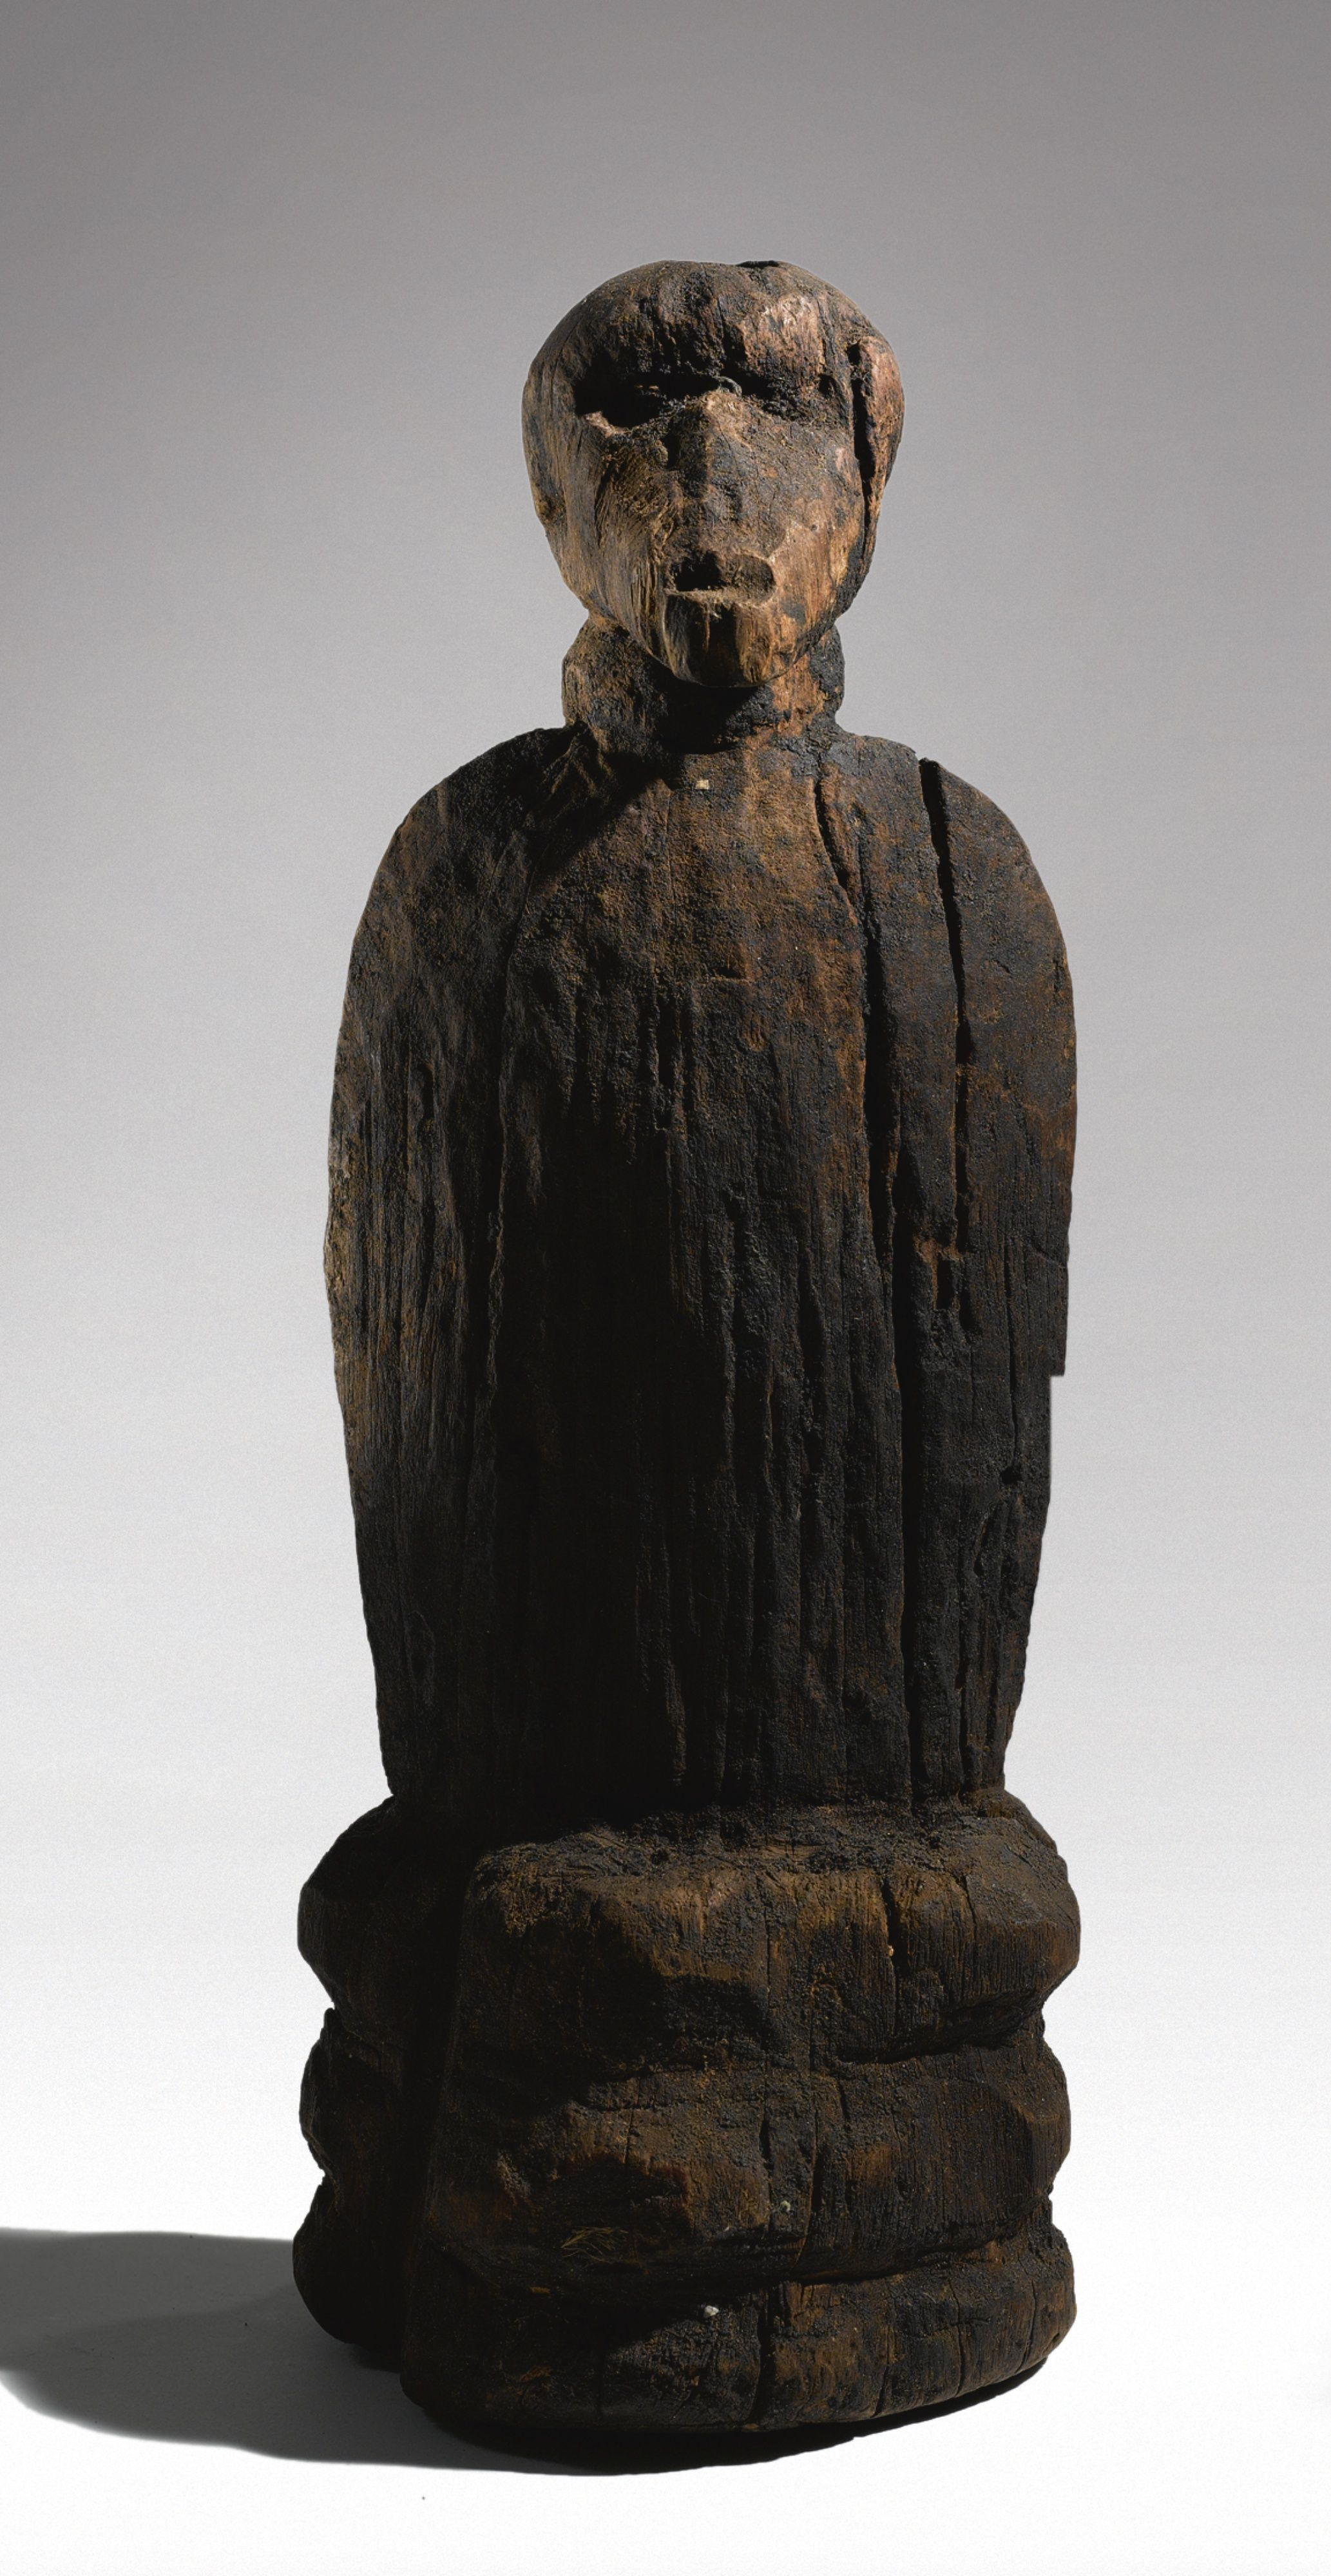 Bidjogo Iran Otibago Figure, Guinea-Bissau http://www.imodara.com/item/guinea-bissau-bidjogo-iran-otibago-soul-container-figure/